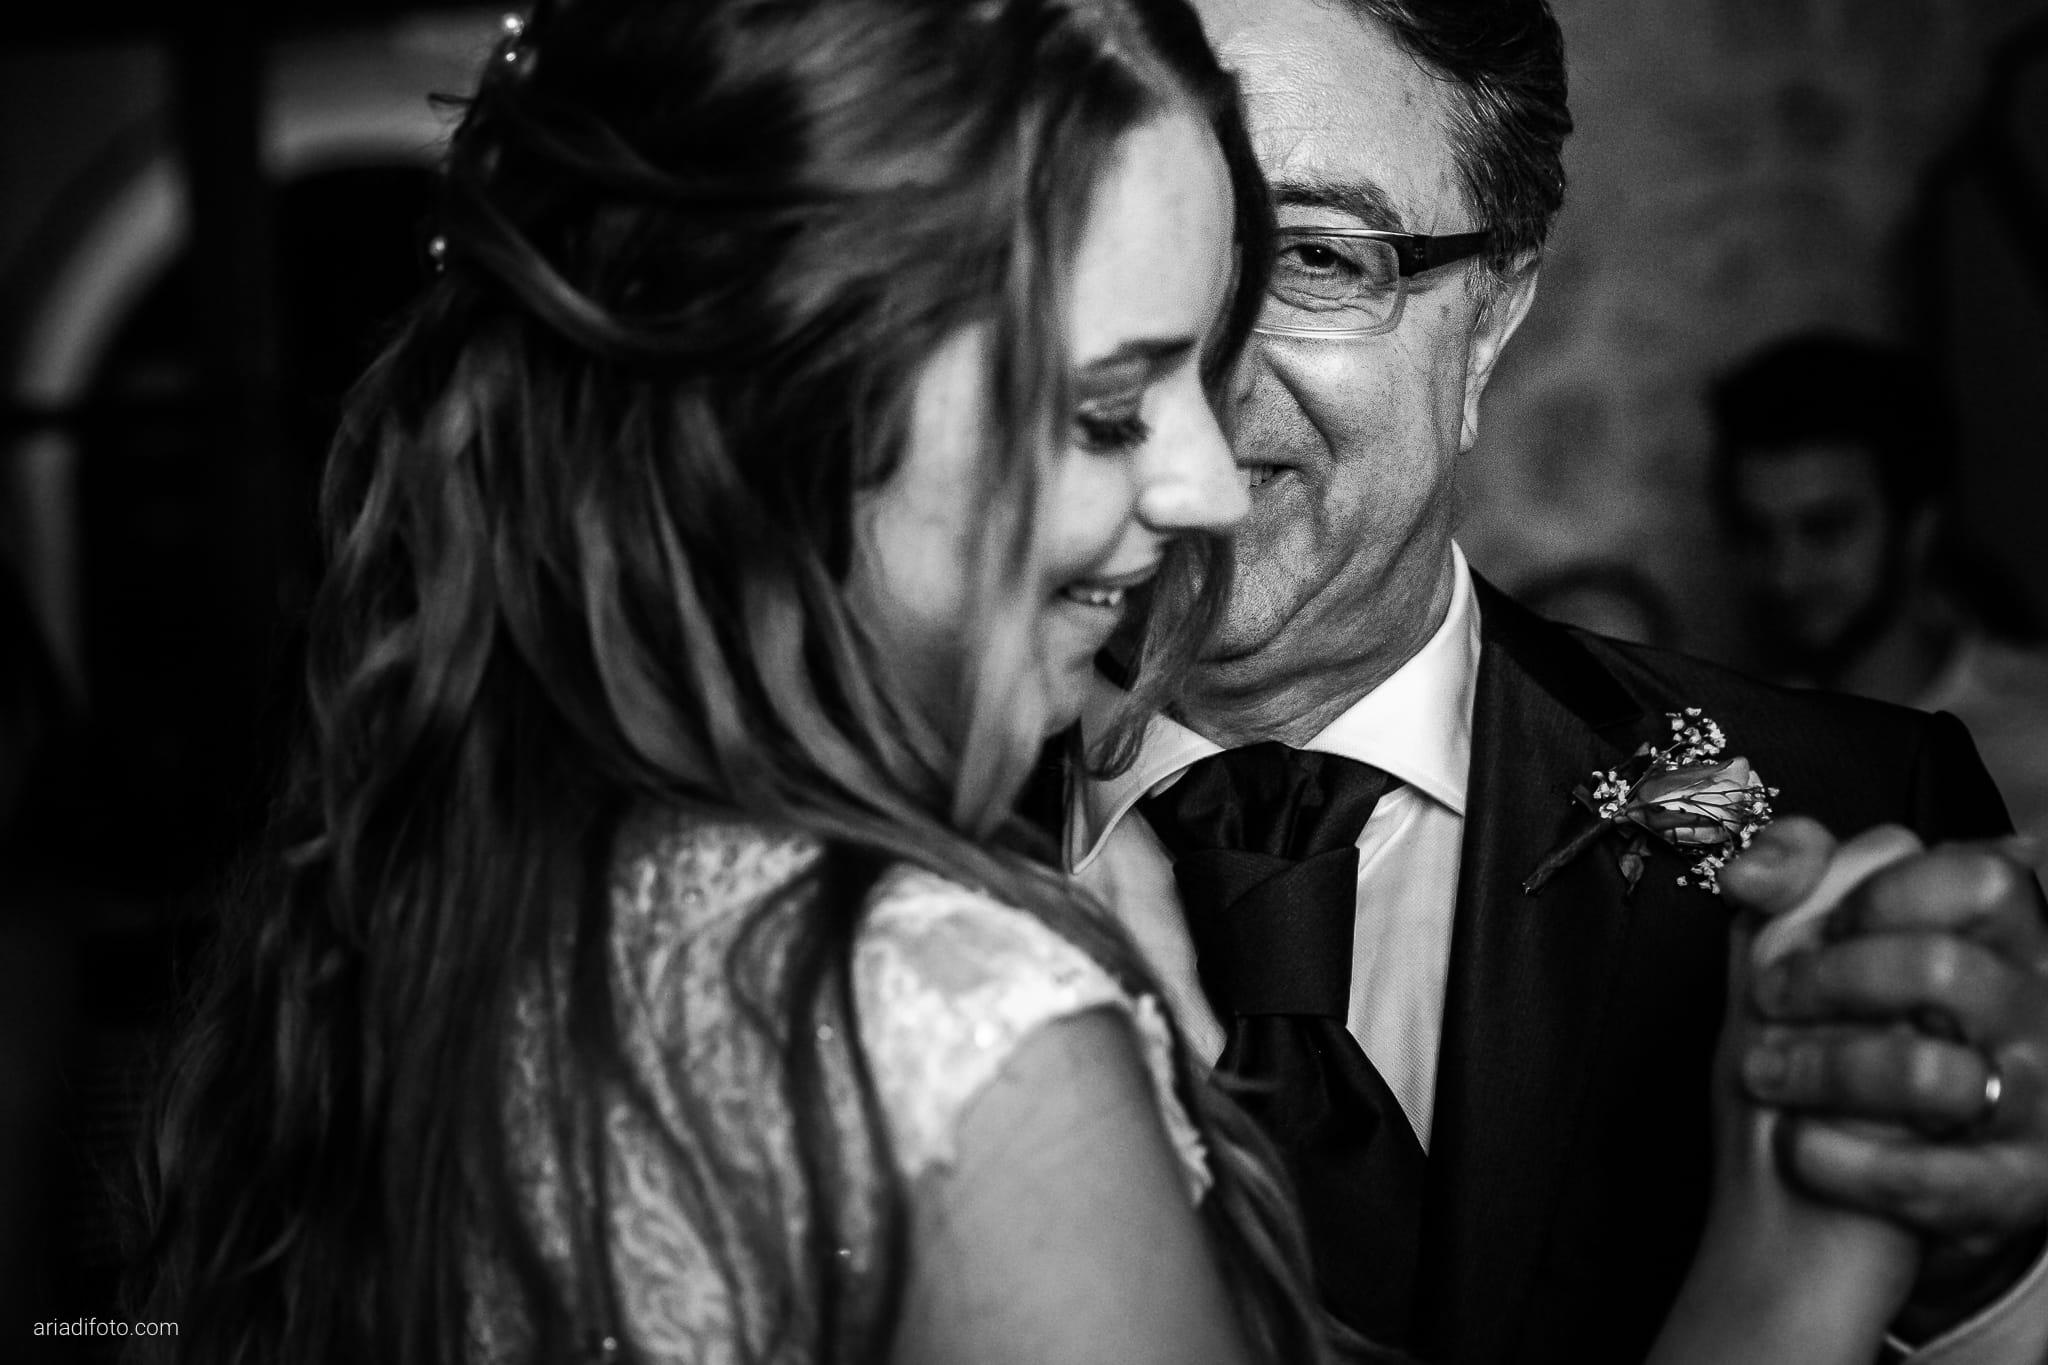 Valentina Francesco Matrimonio Pagnacco Castello Villalta Fagagna Udine ricevimento festa primo ballo papà